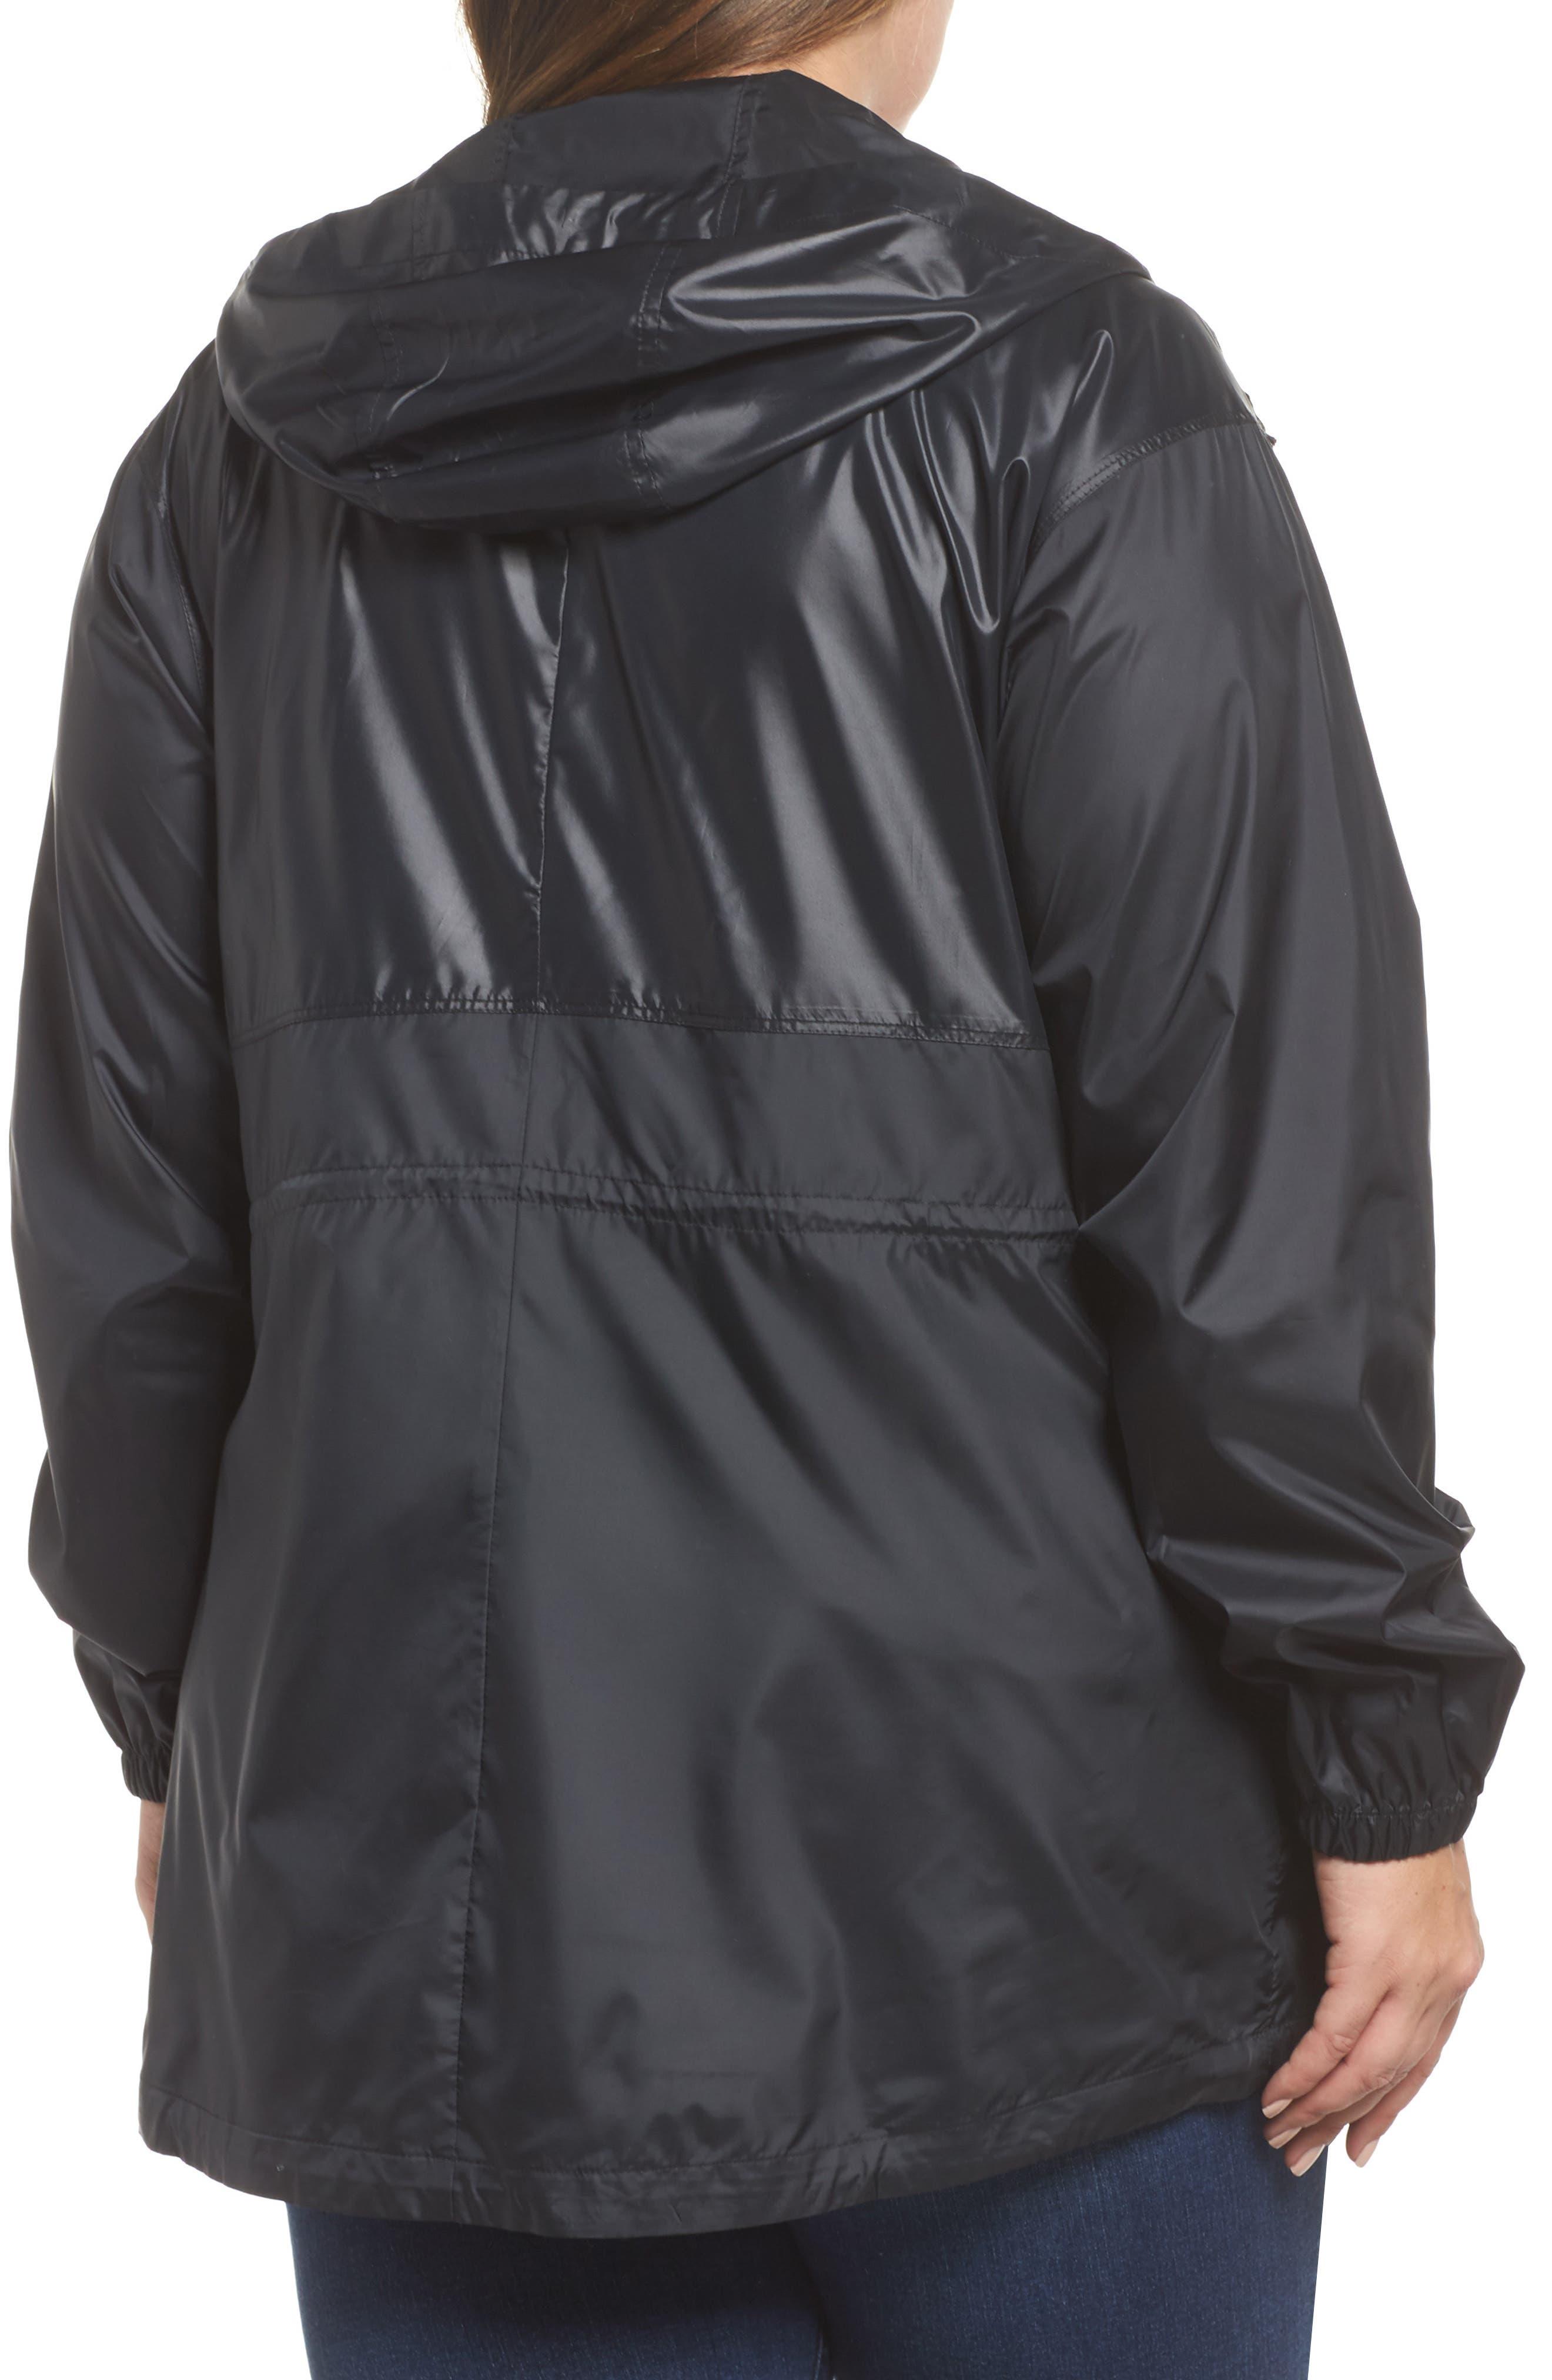 Flashback<sup>™</sup> Water Resistant Hooded Windbreaker,                             Alternate thumbnail 2, color,                             Black Shiny/ Matte White